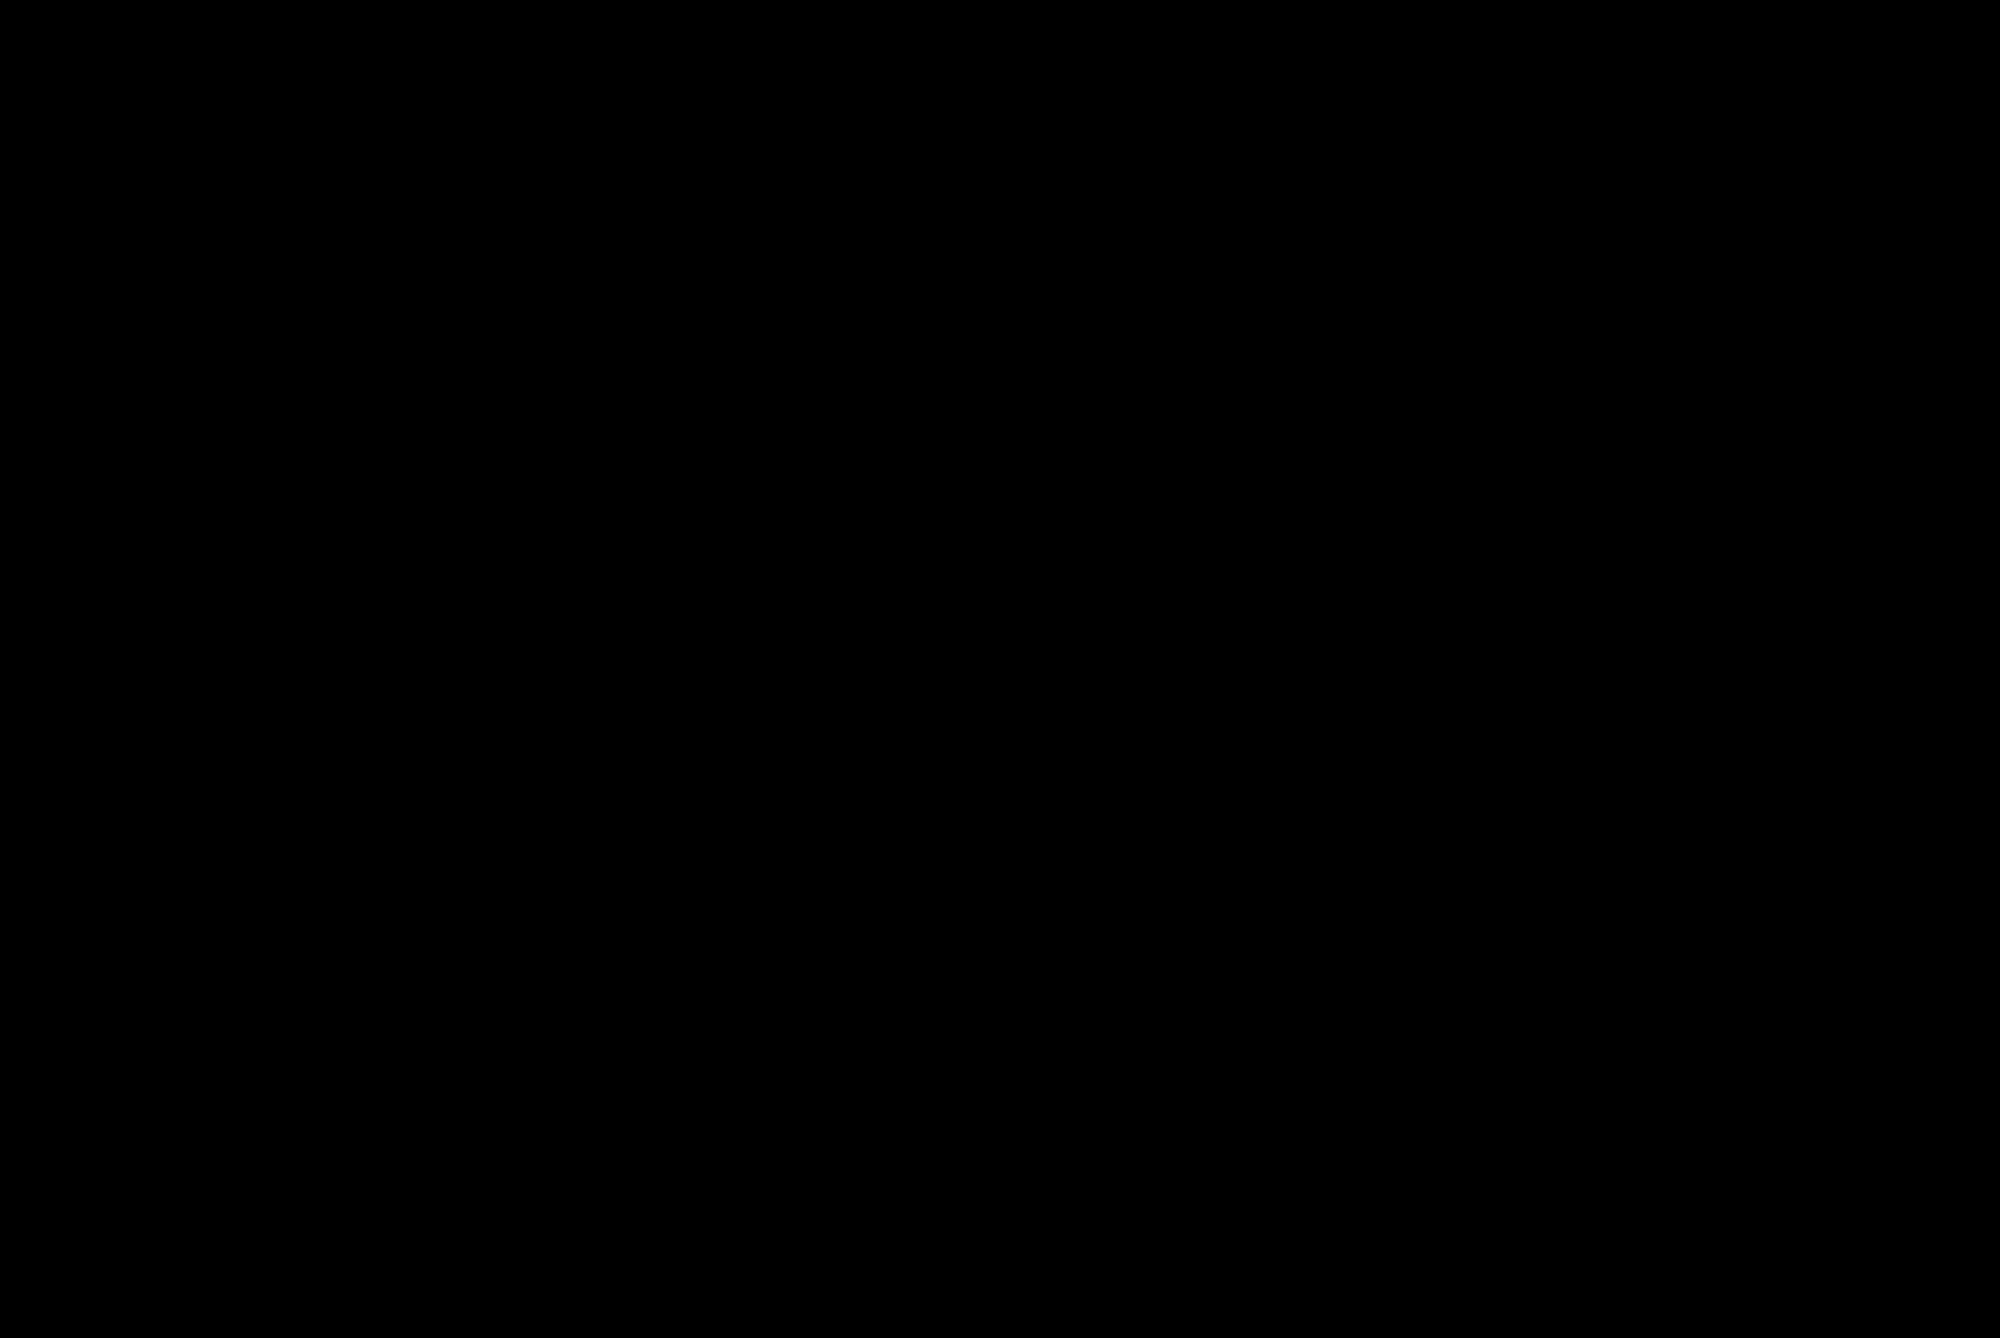 Number 4 clipart six. File sigma svg wikimedia